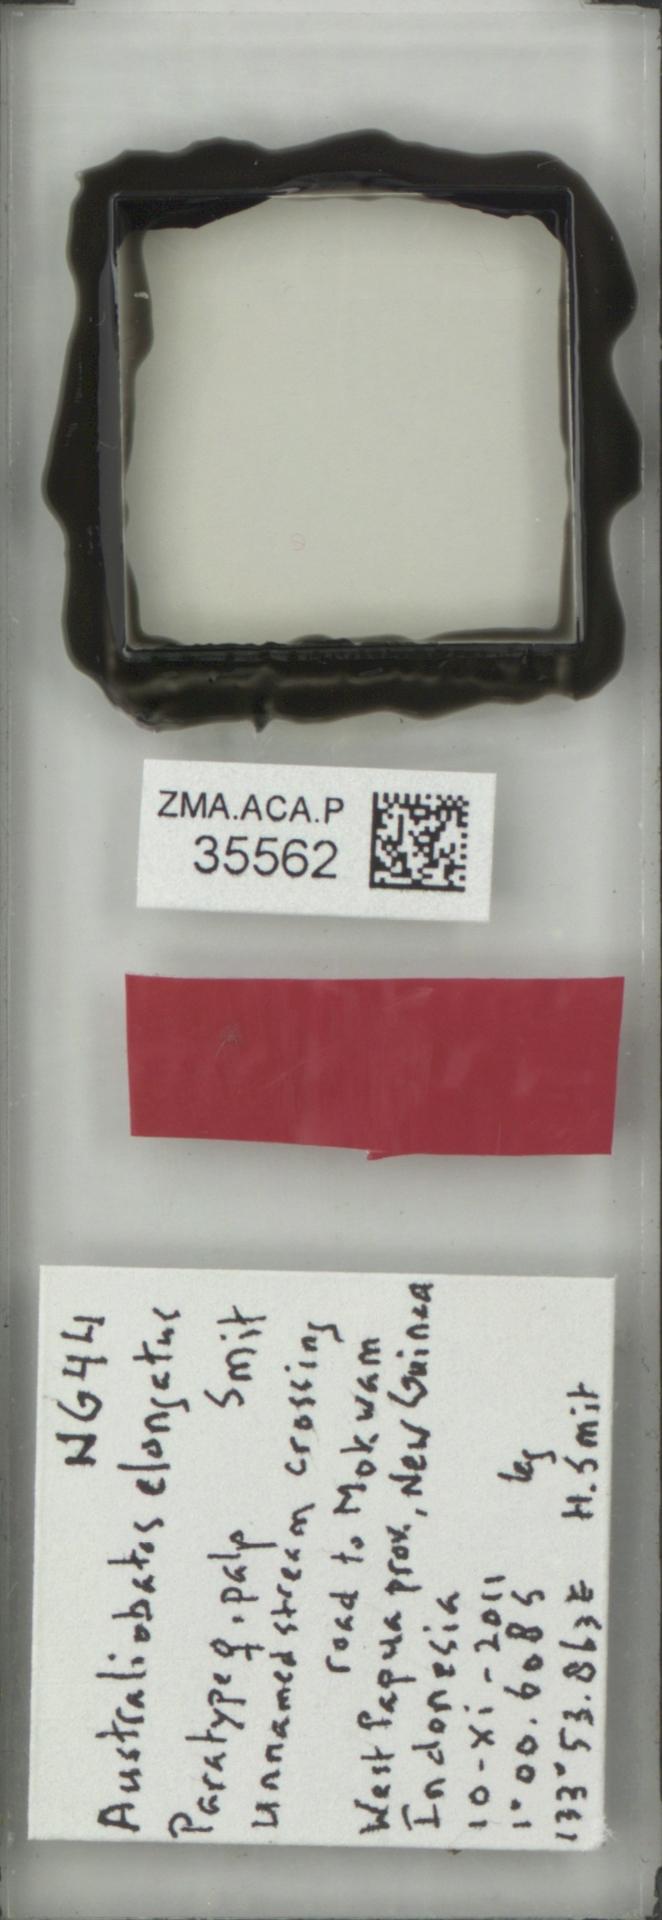 ZMA.ACA.P.35562 | Australiobates elongatus Smit, 2013